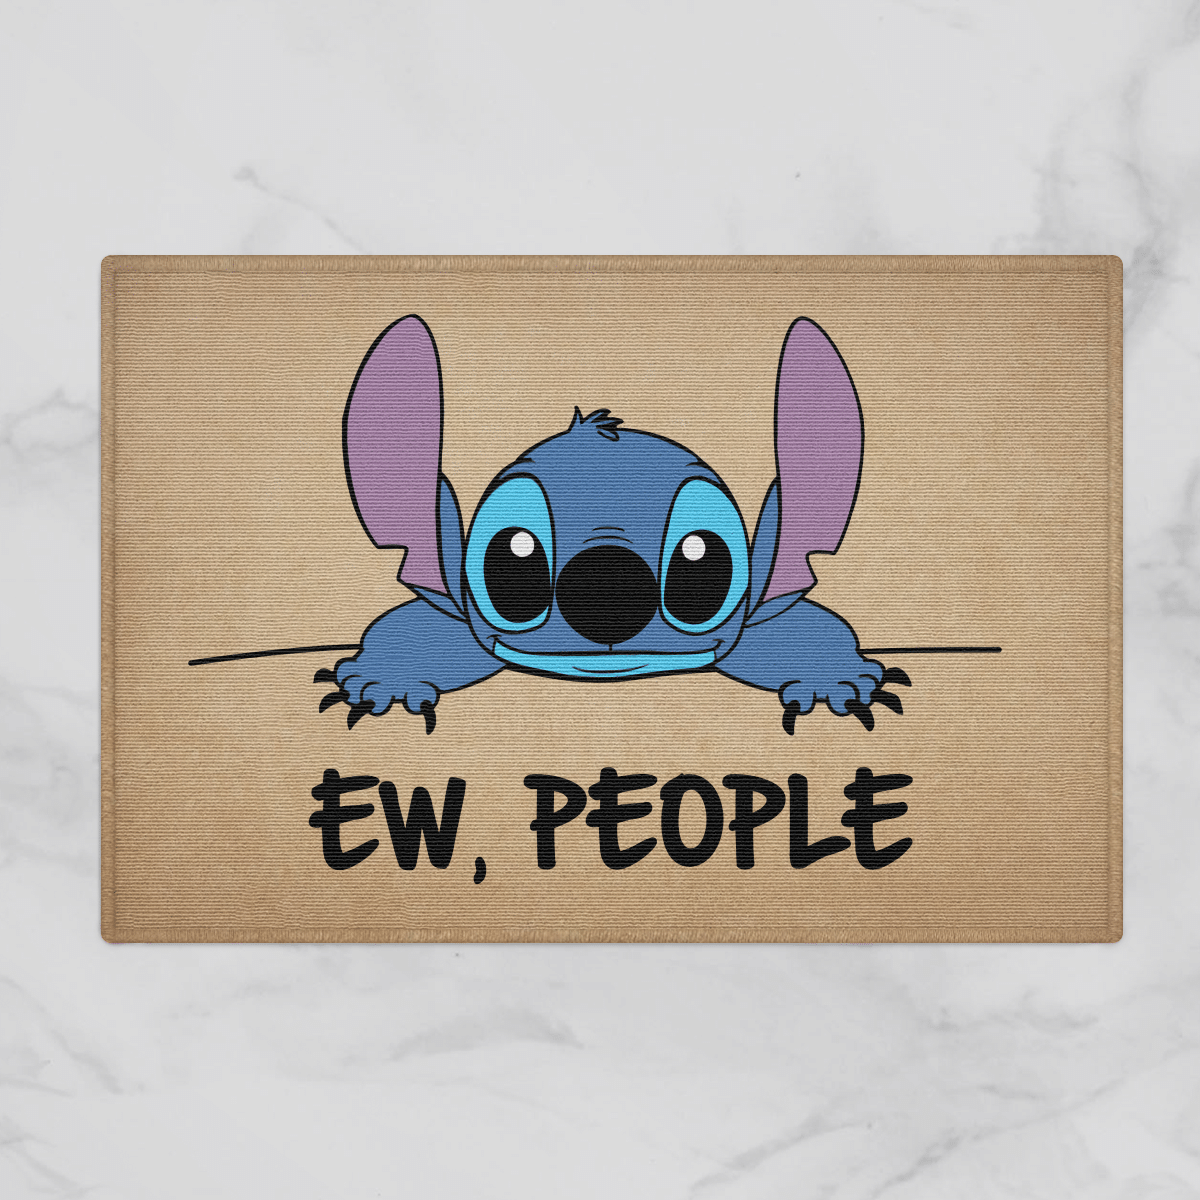 Stitch Disney Ew People Door Mat Bath Mat